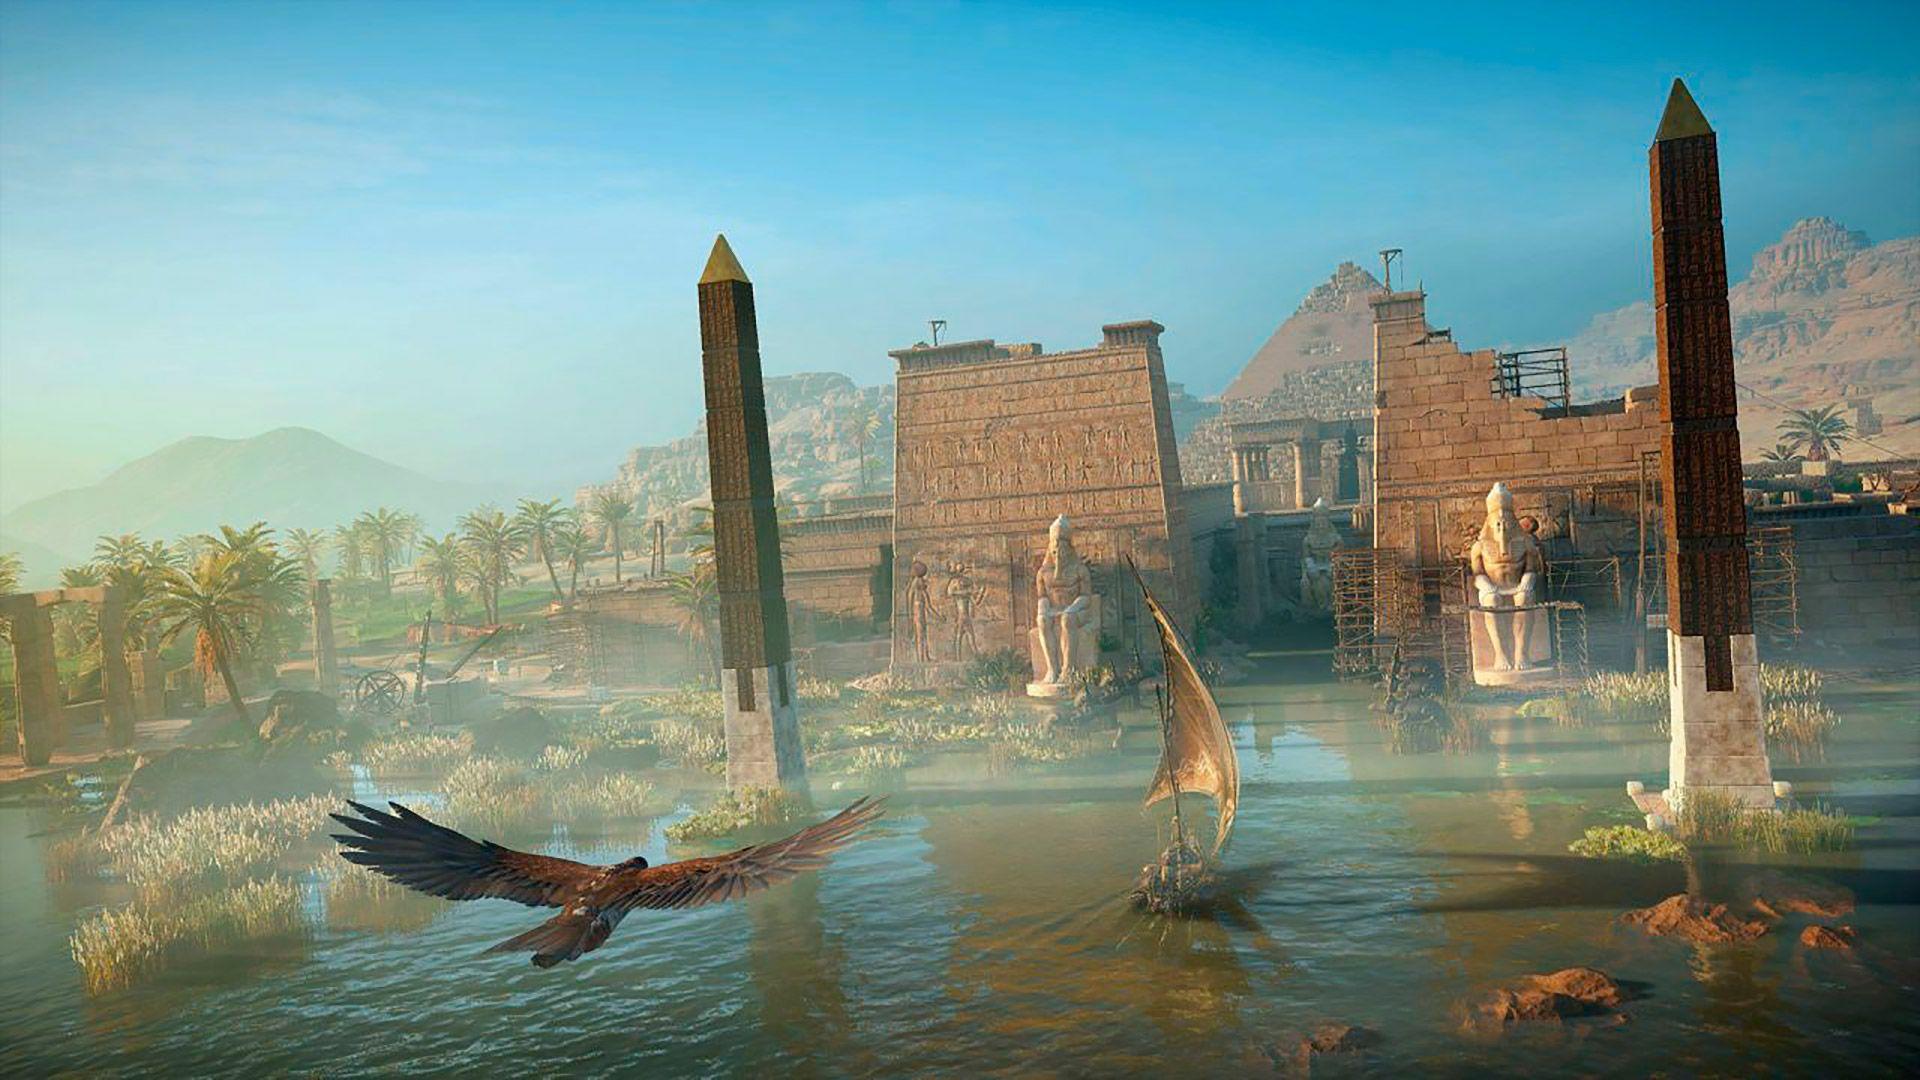 Assassin's Creed Истоки изображение 3